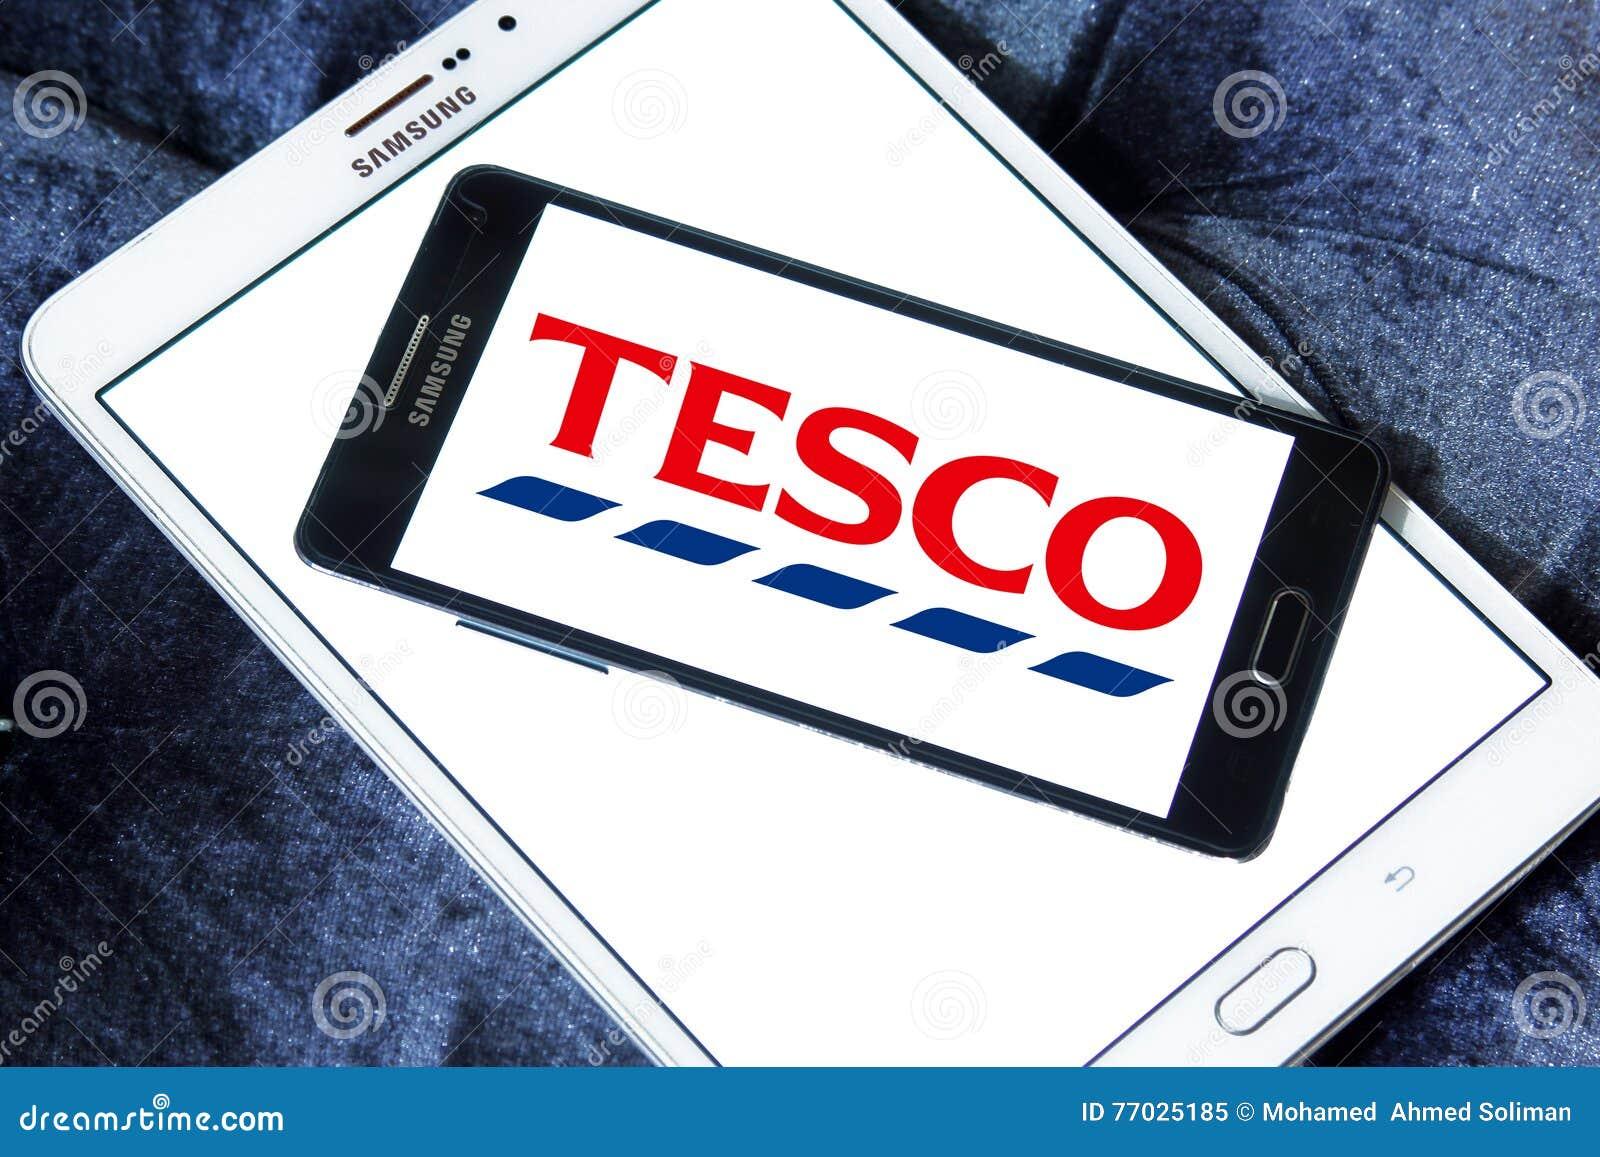 Tesco stores logo editorial image image of sign logos for Mobili convenienti